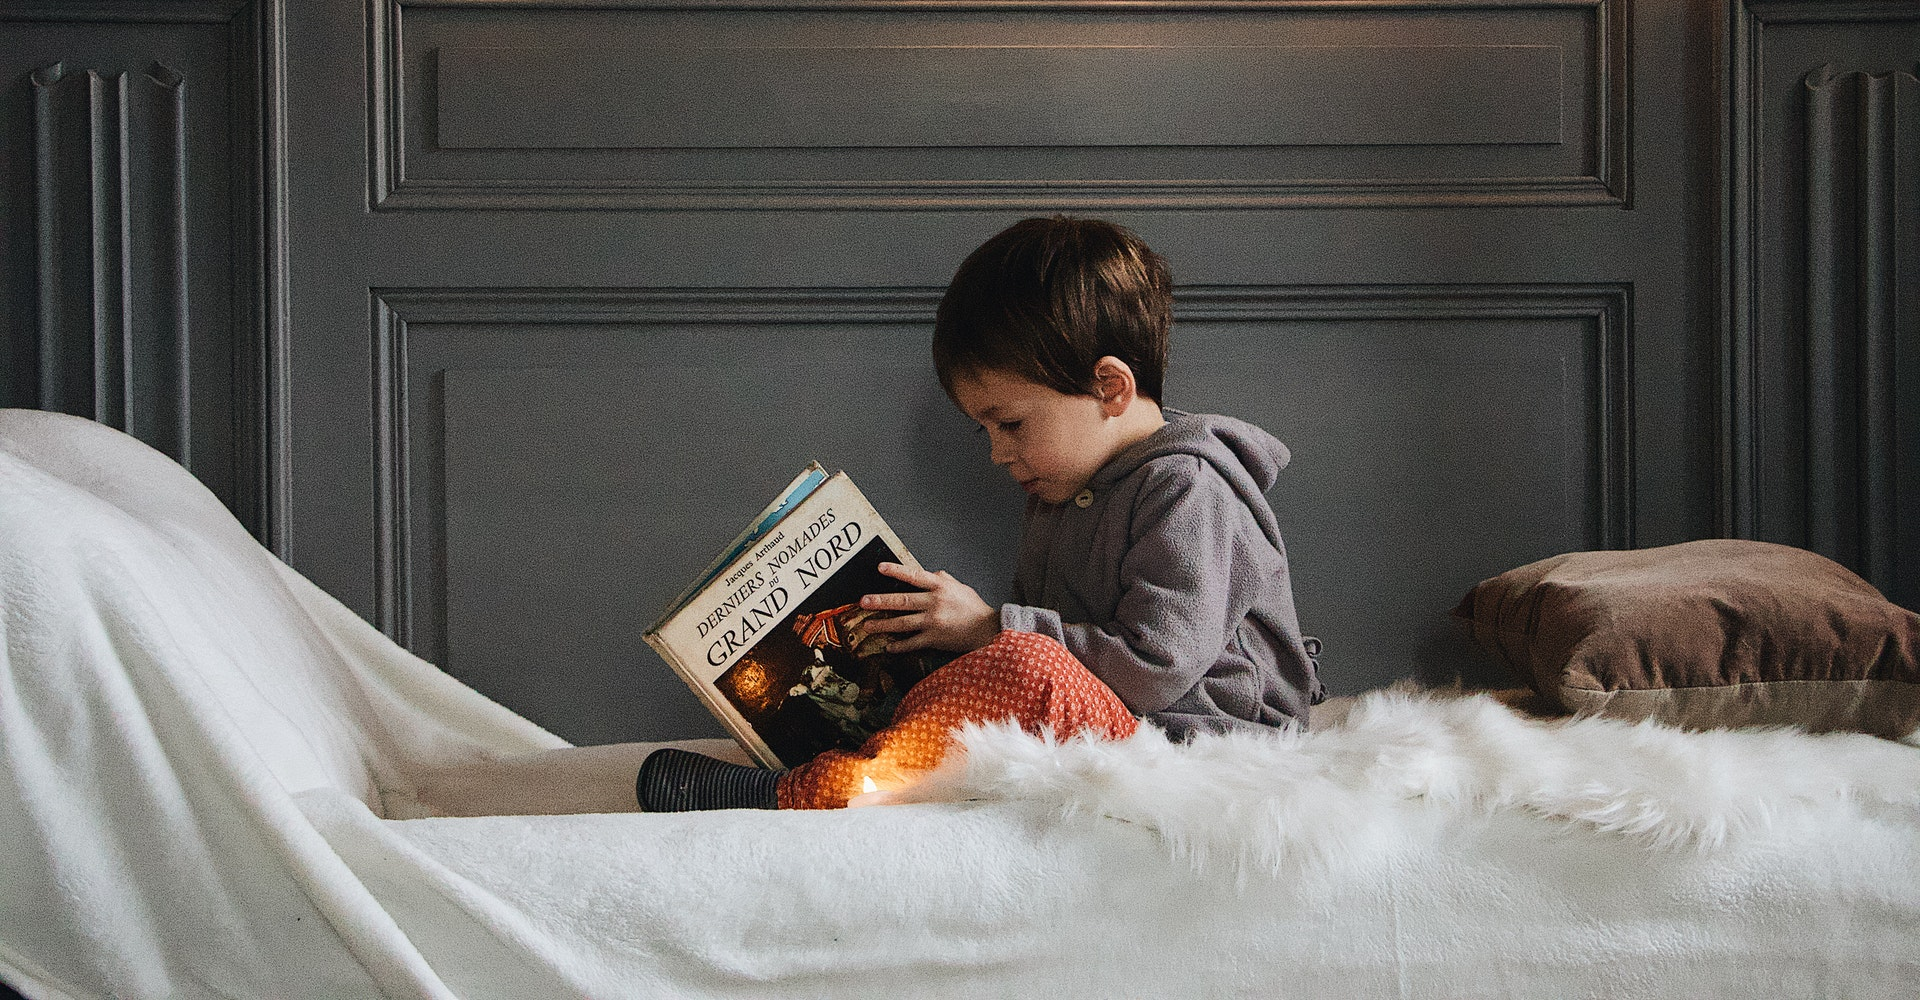 Childrens-book-publishing